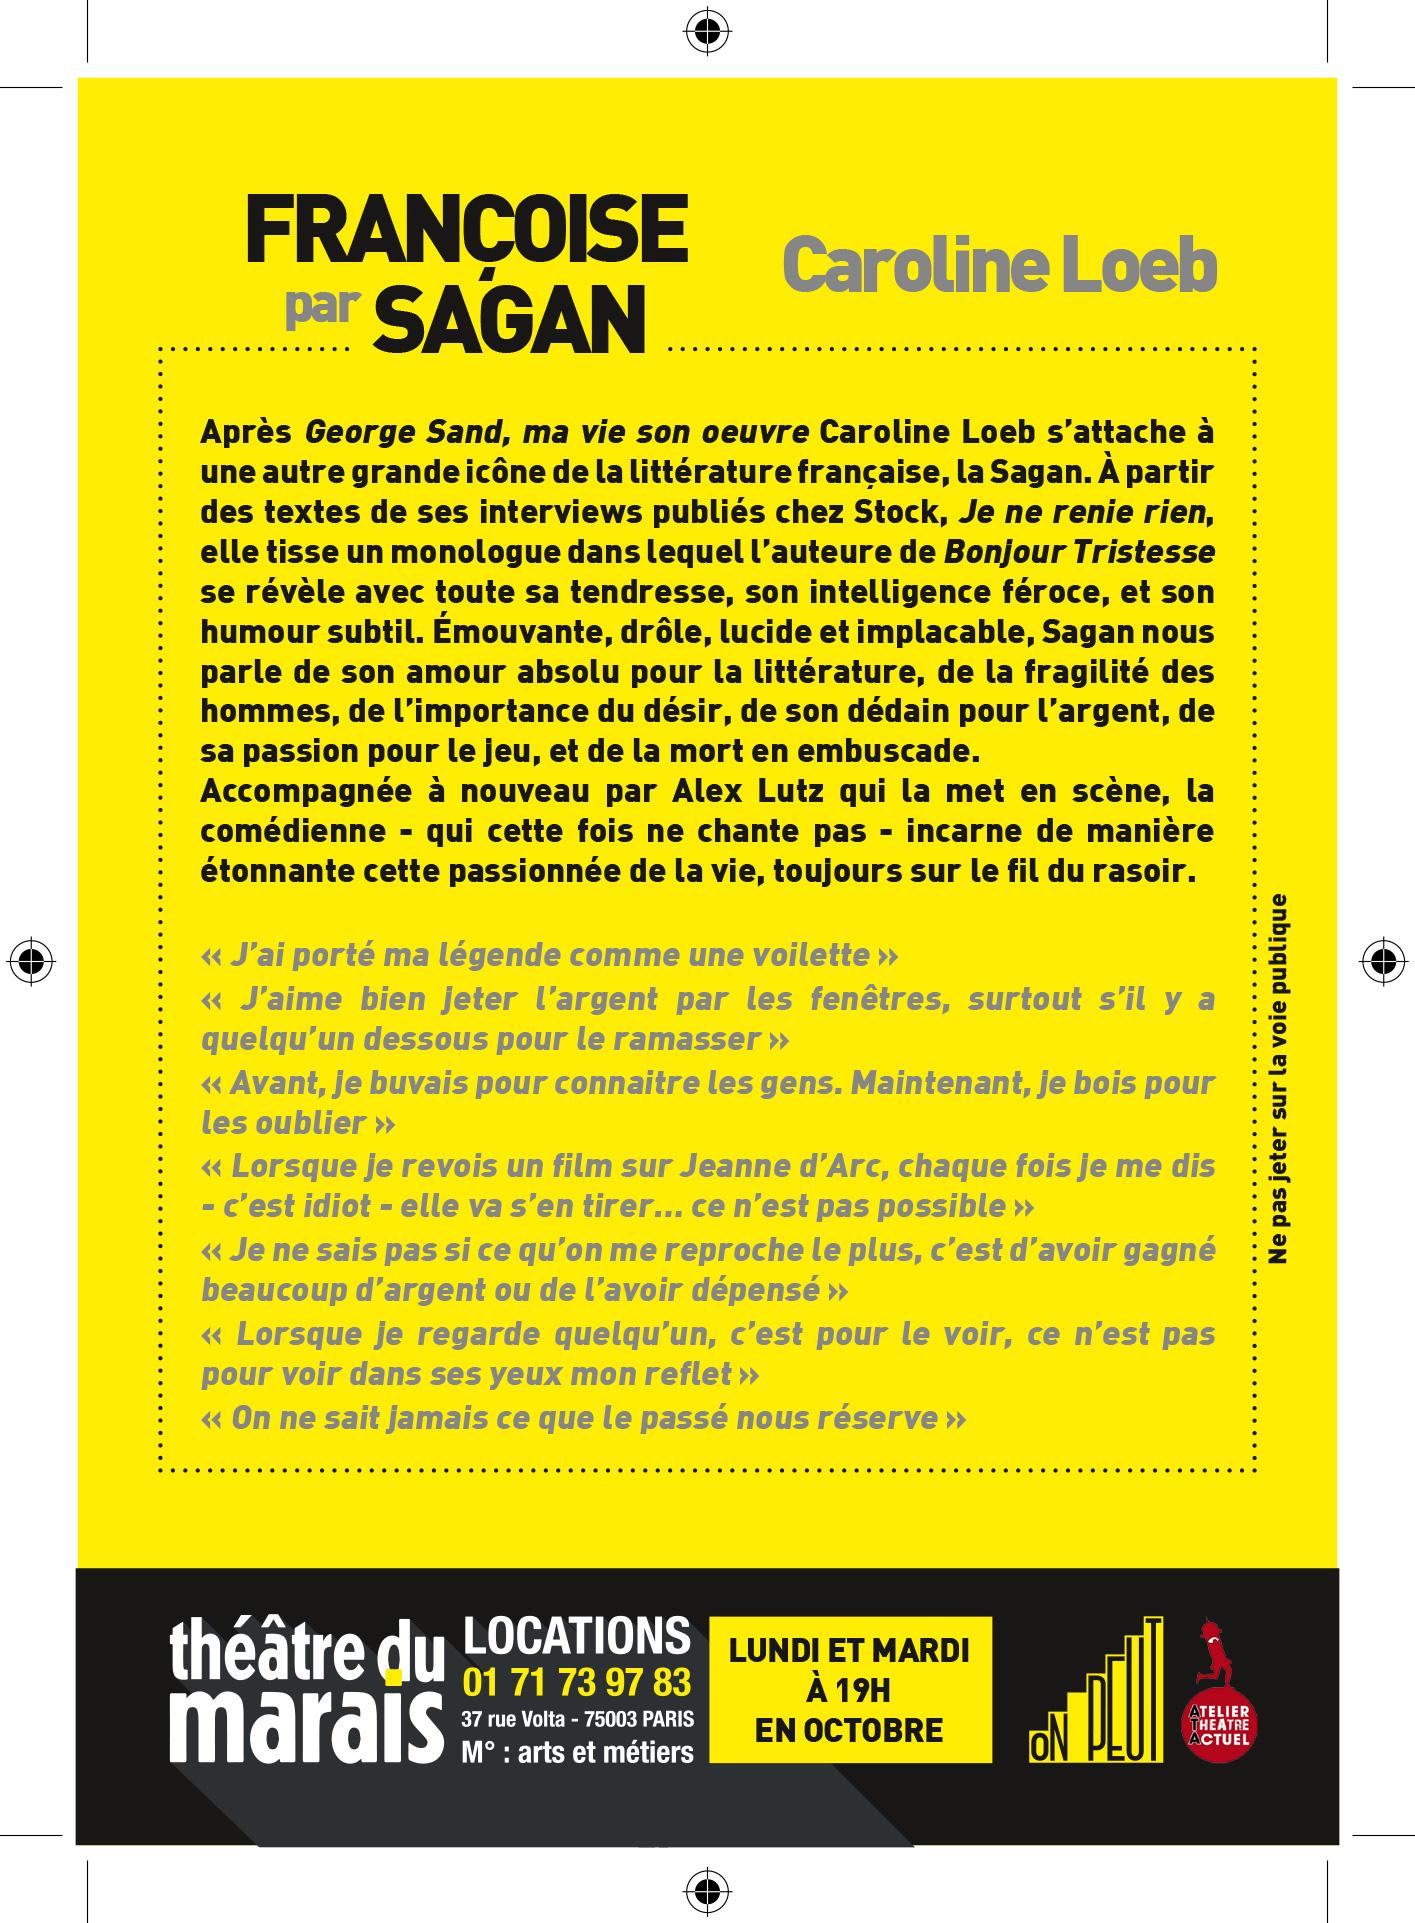 francoiseparsagan_10x15_theatremarais_octobre2016_print-2